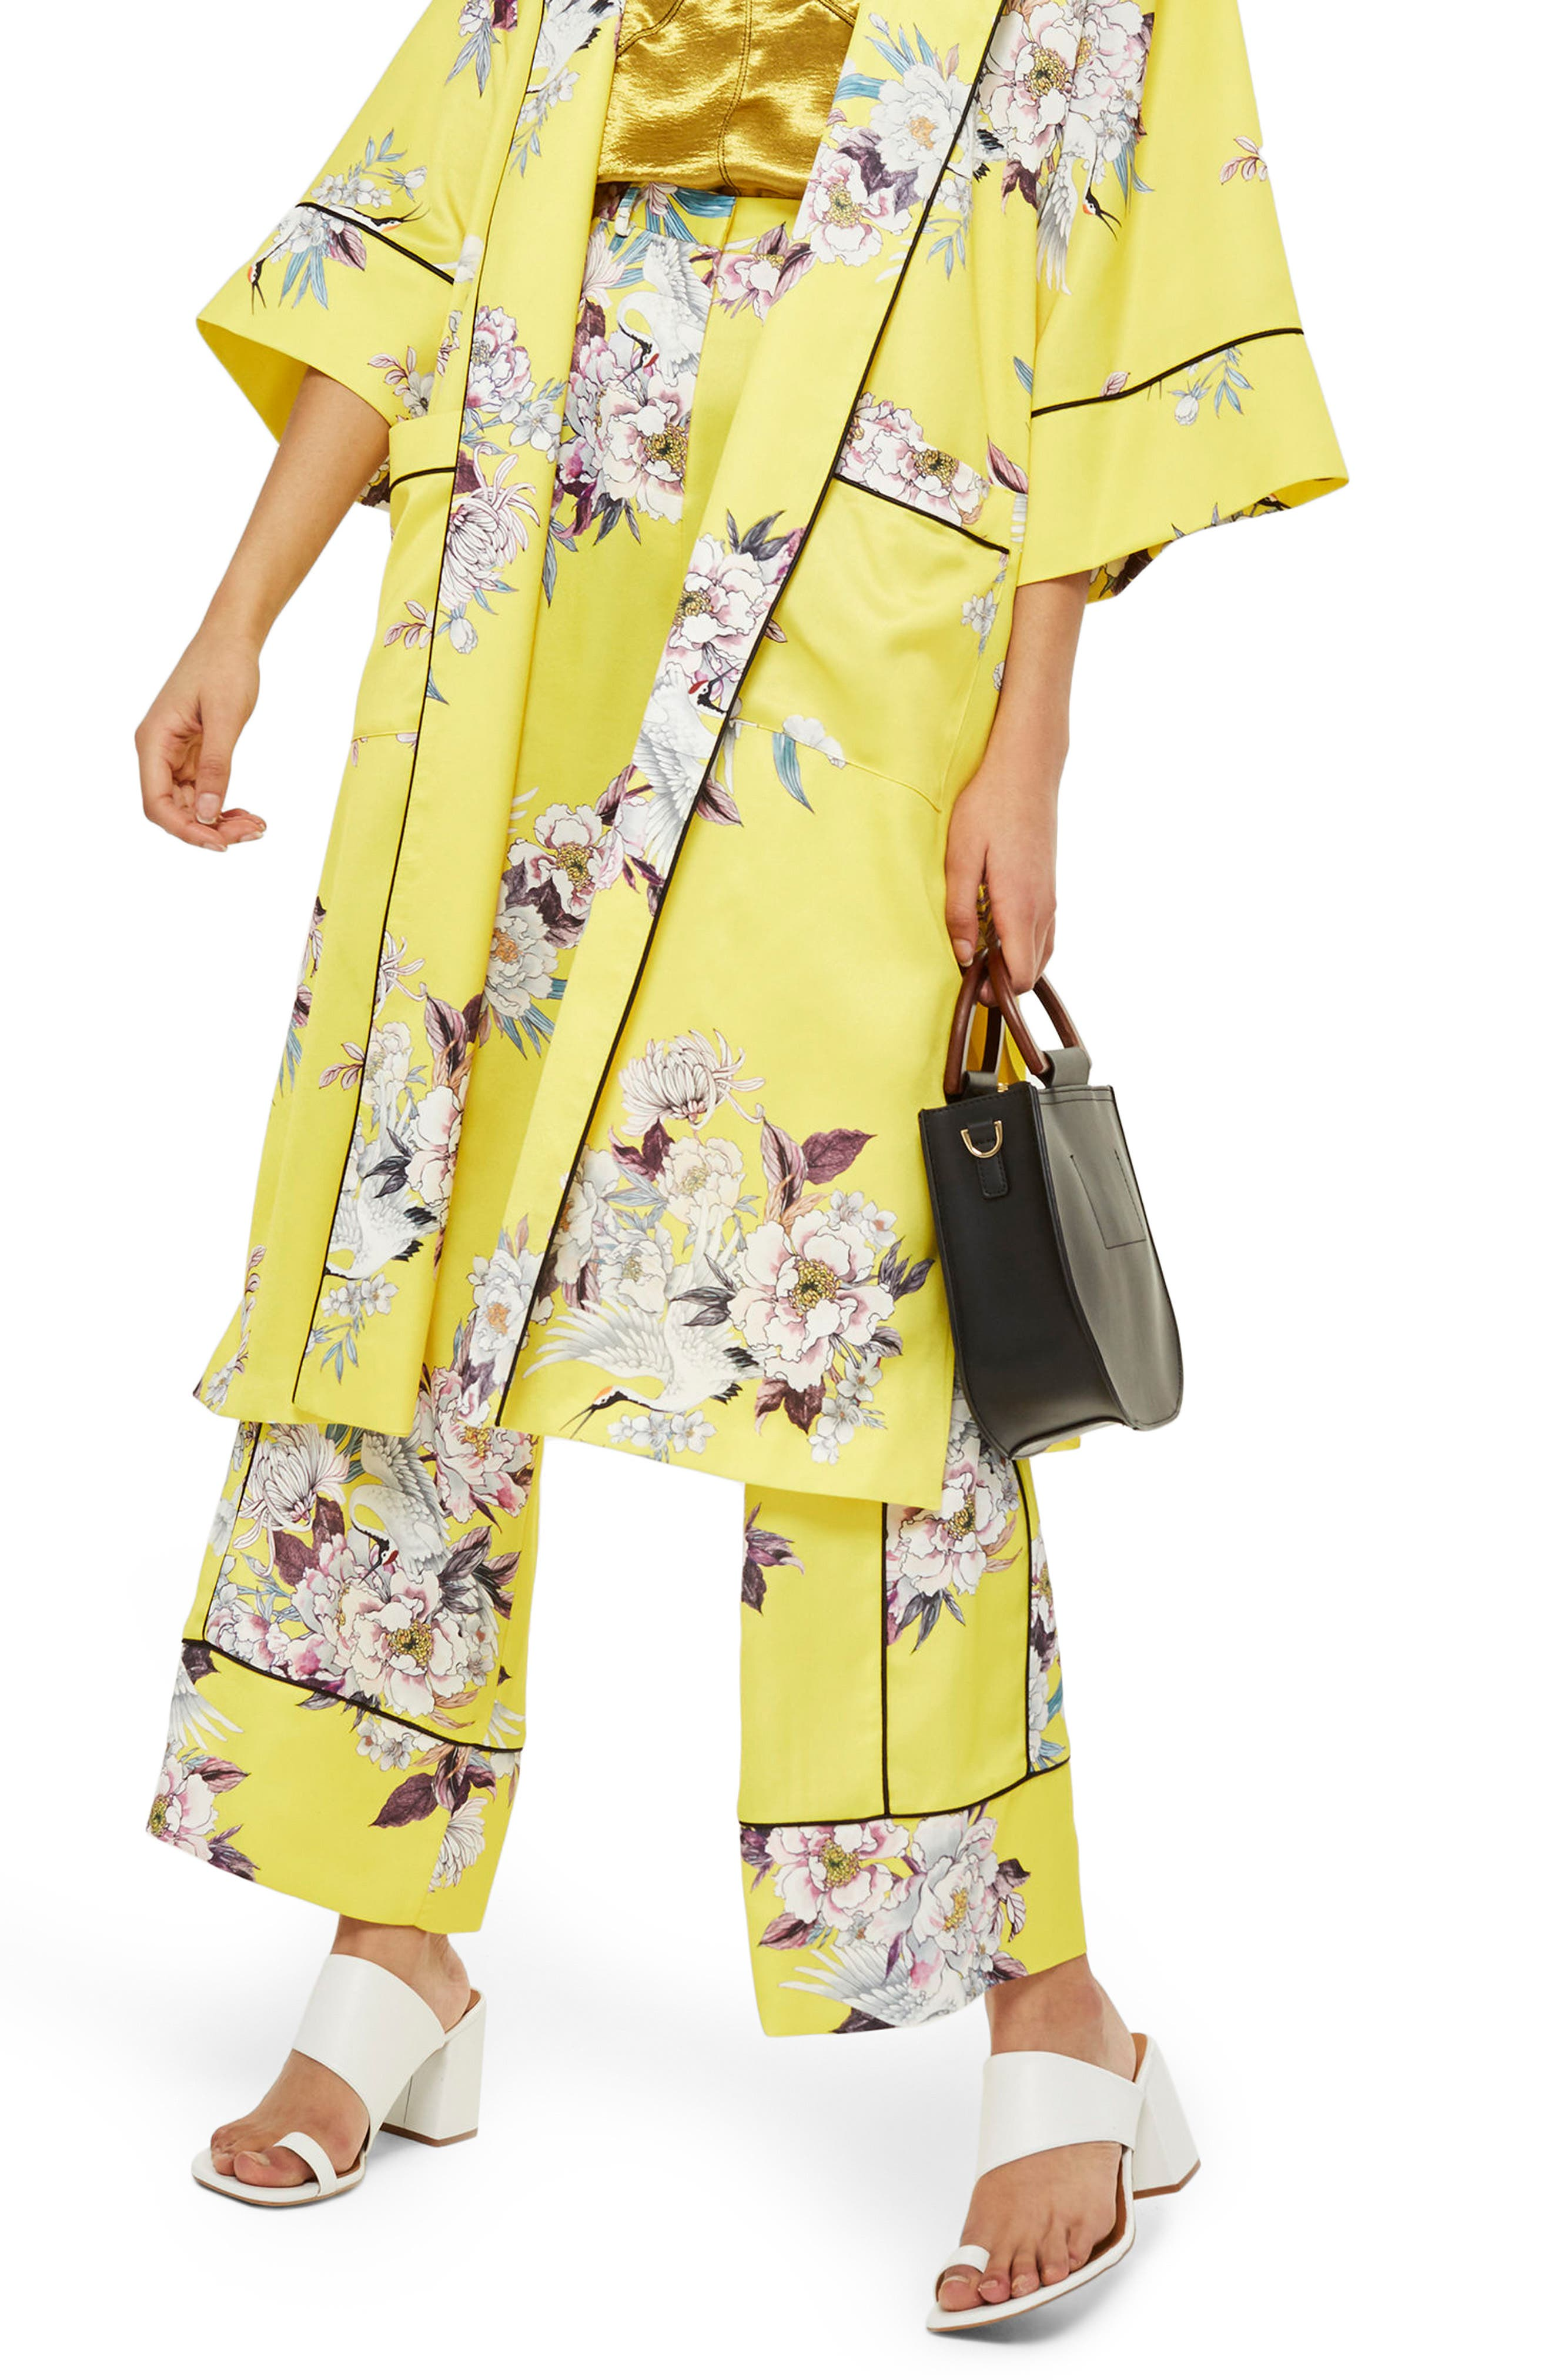 Heron Pajama Wide Leg Trousers,                         Main,                         color, Yellow Multi